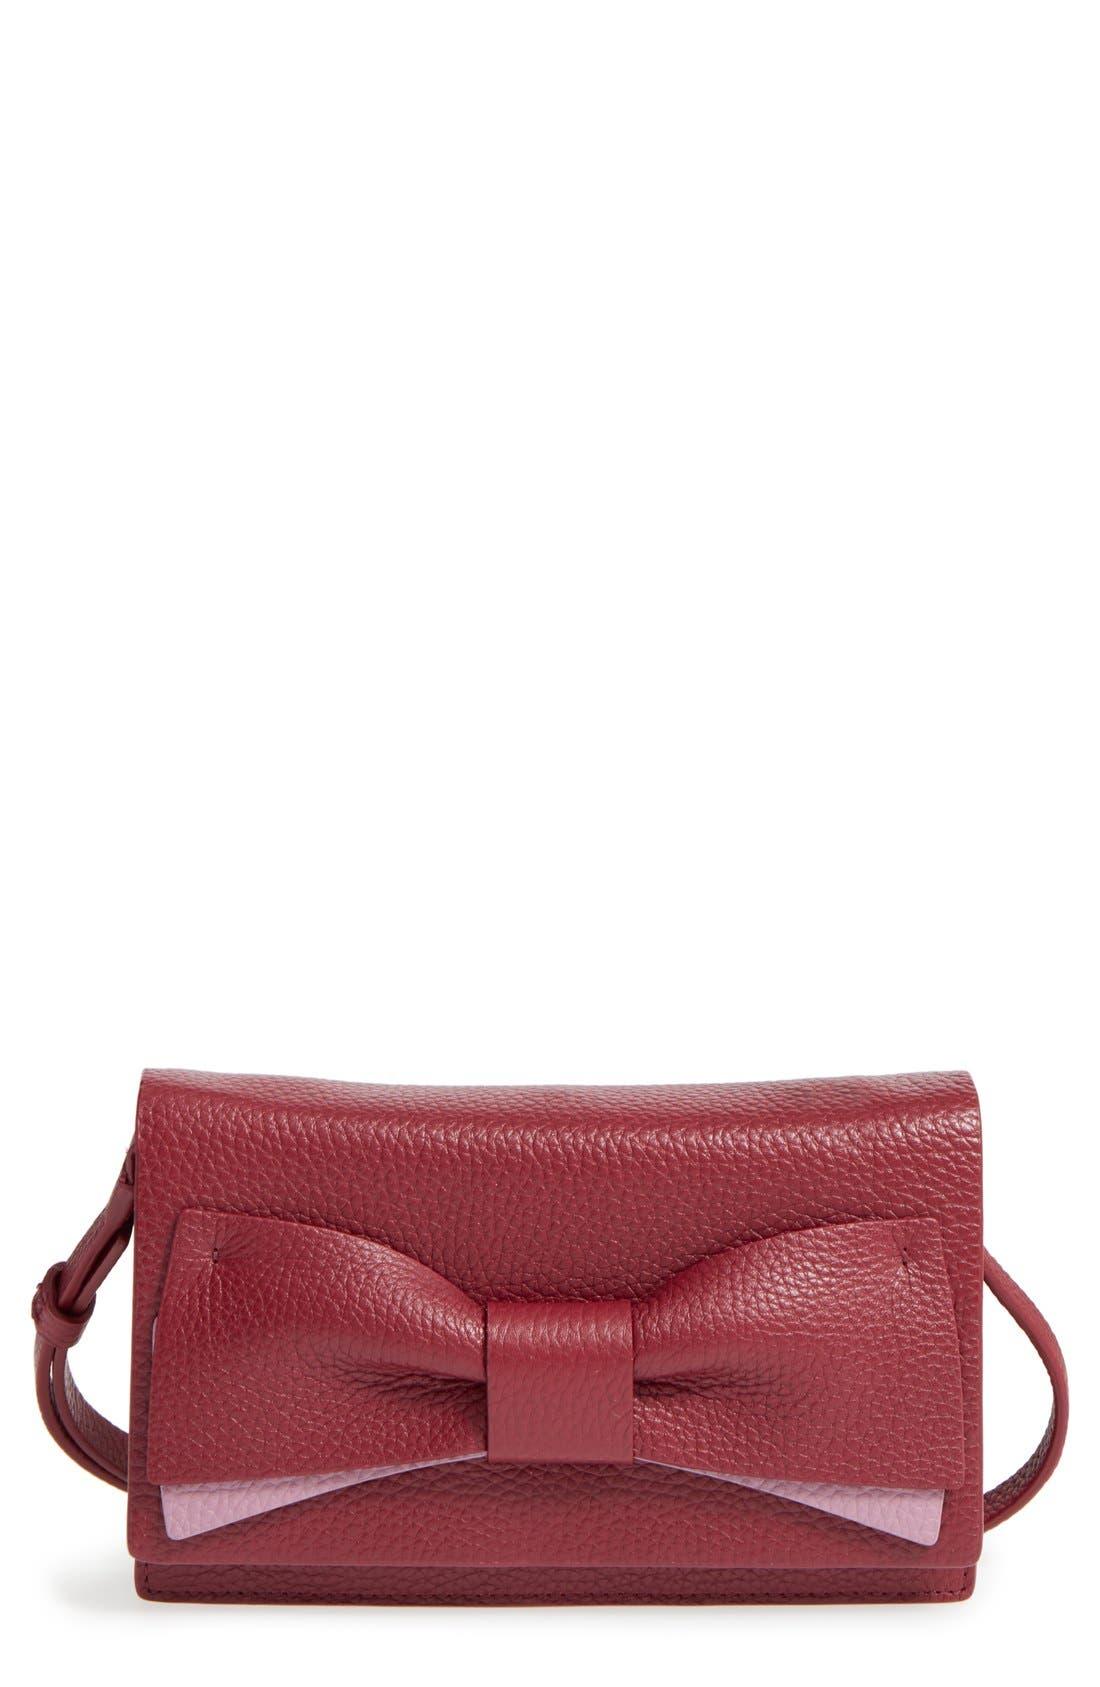 Main Image - kate spade new york 'eden lane - jacinda' crossbody bag